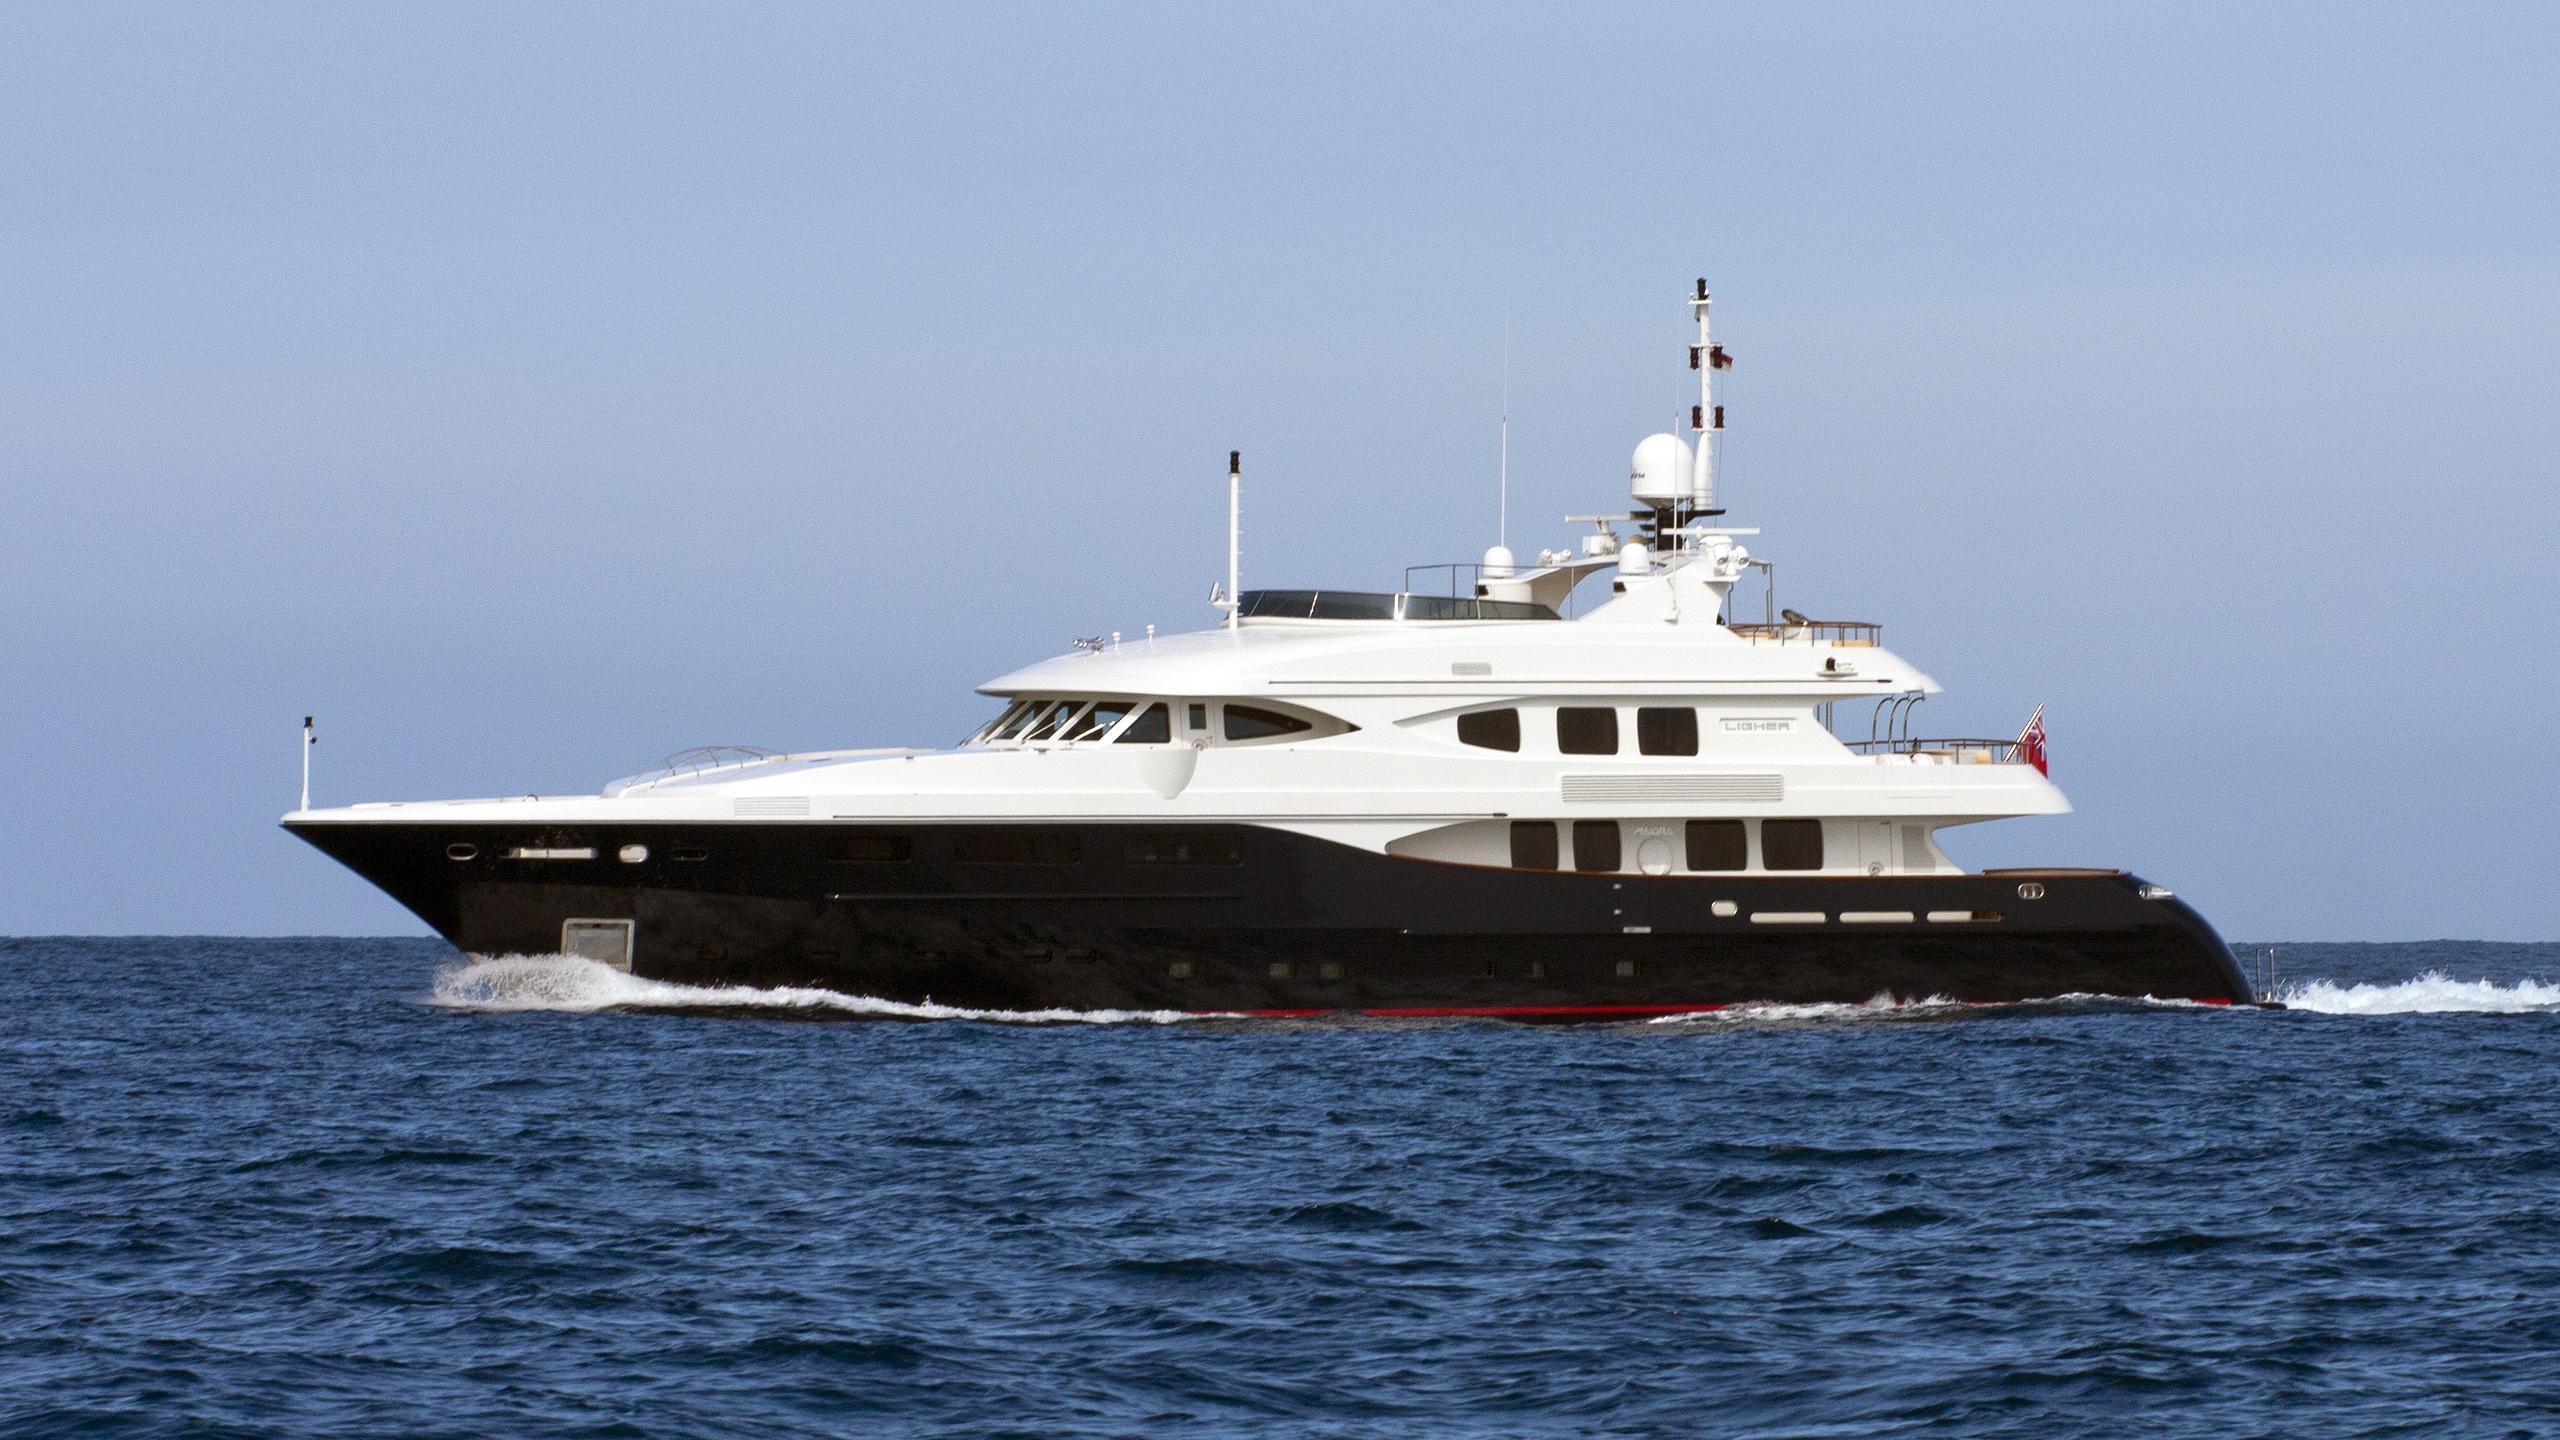 lighea-motor-yacht-maiora-43tp-2005-43m-profile